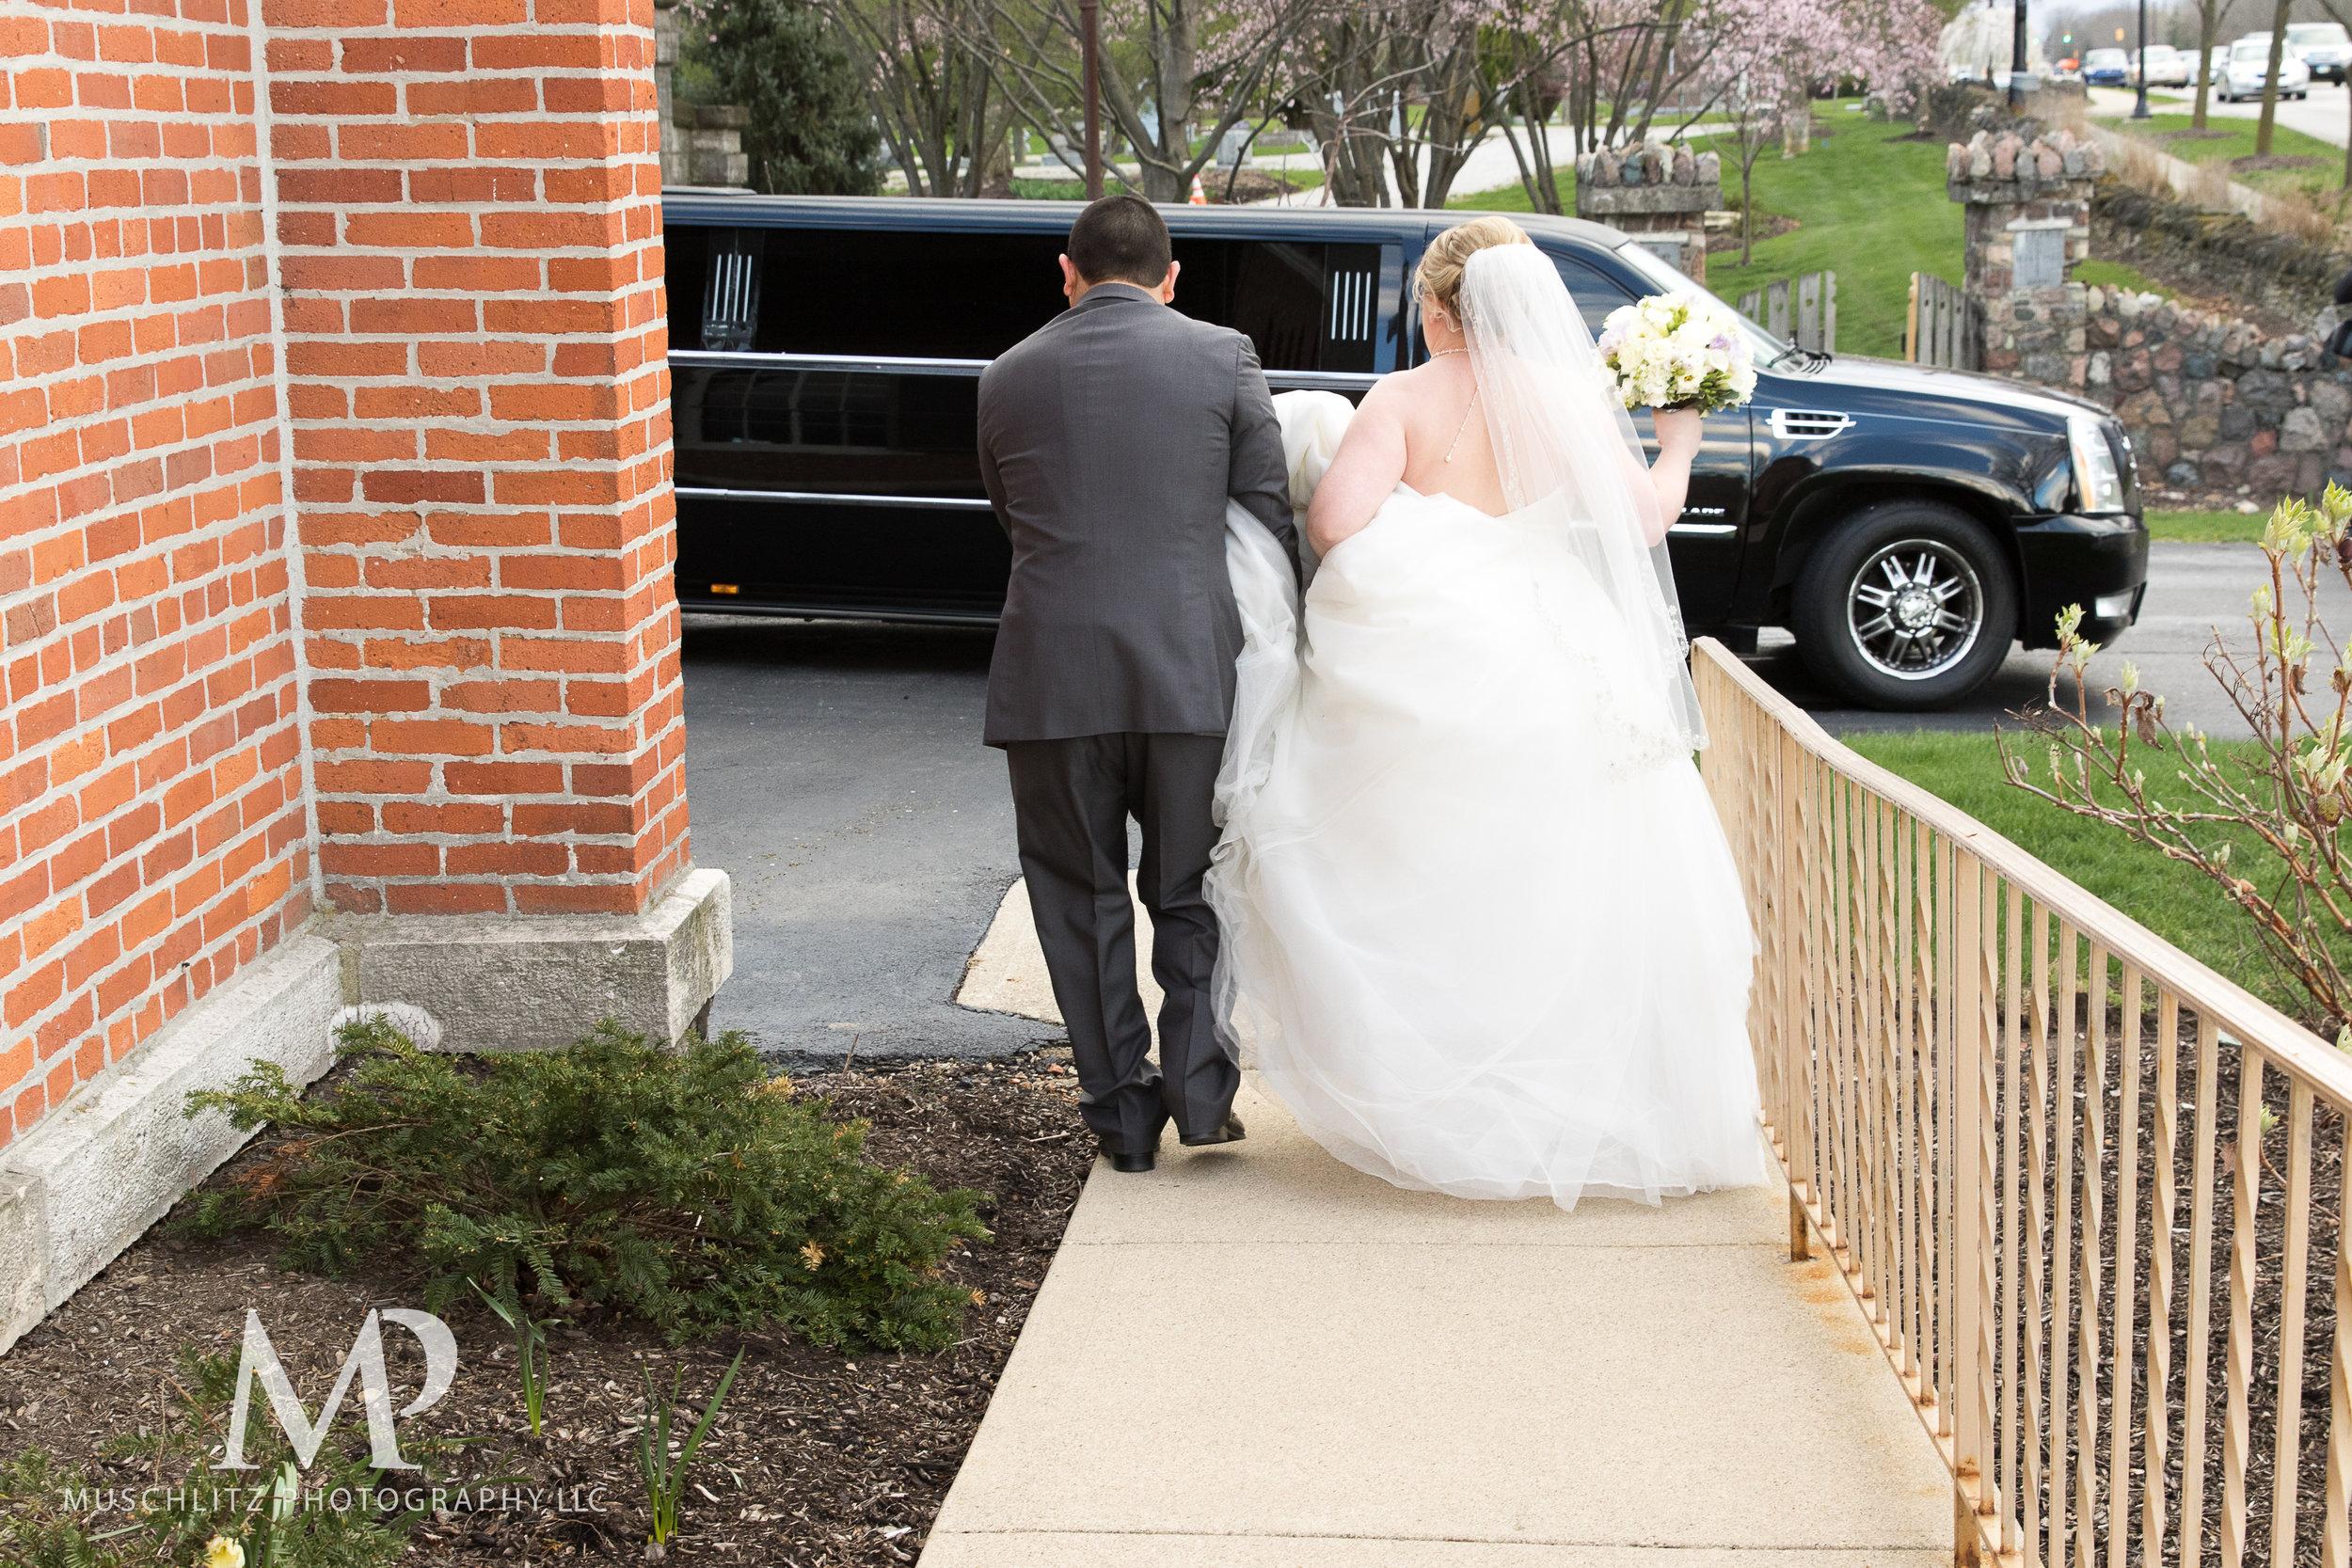 dublin-community-church-wedding-columbus-ohio-muschlitz-photography-095.JPG